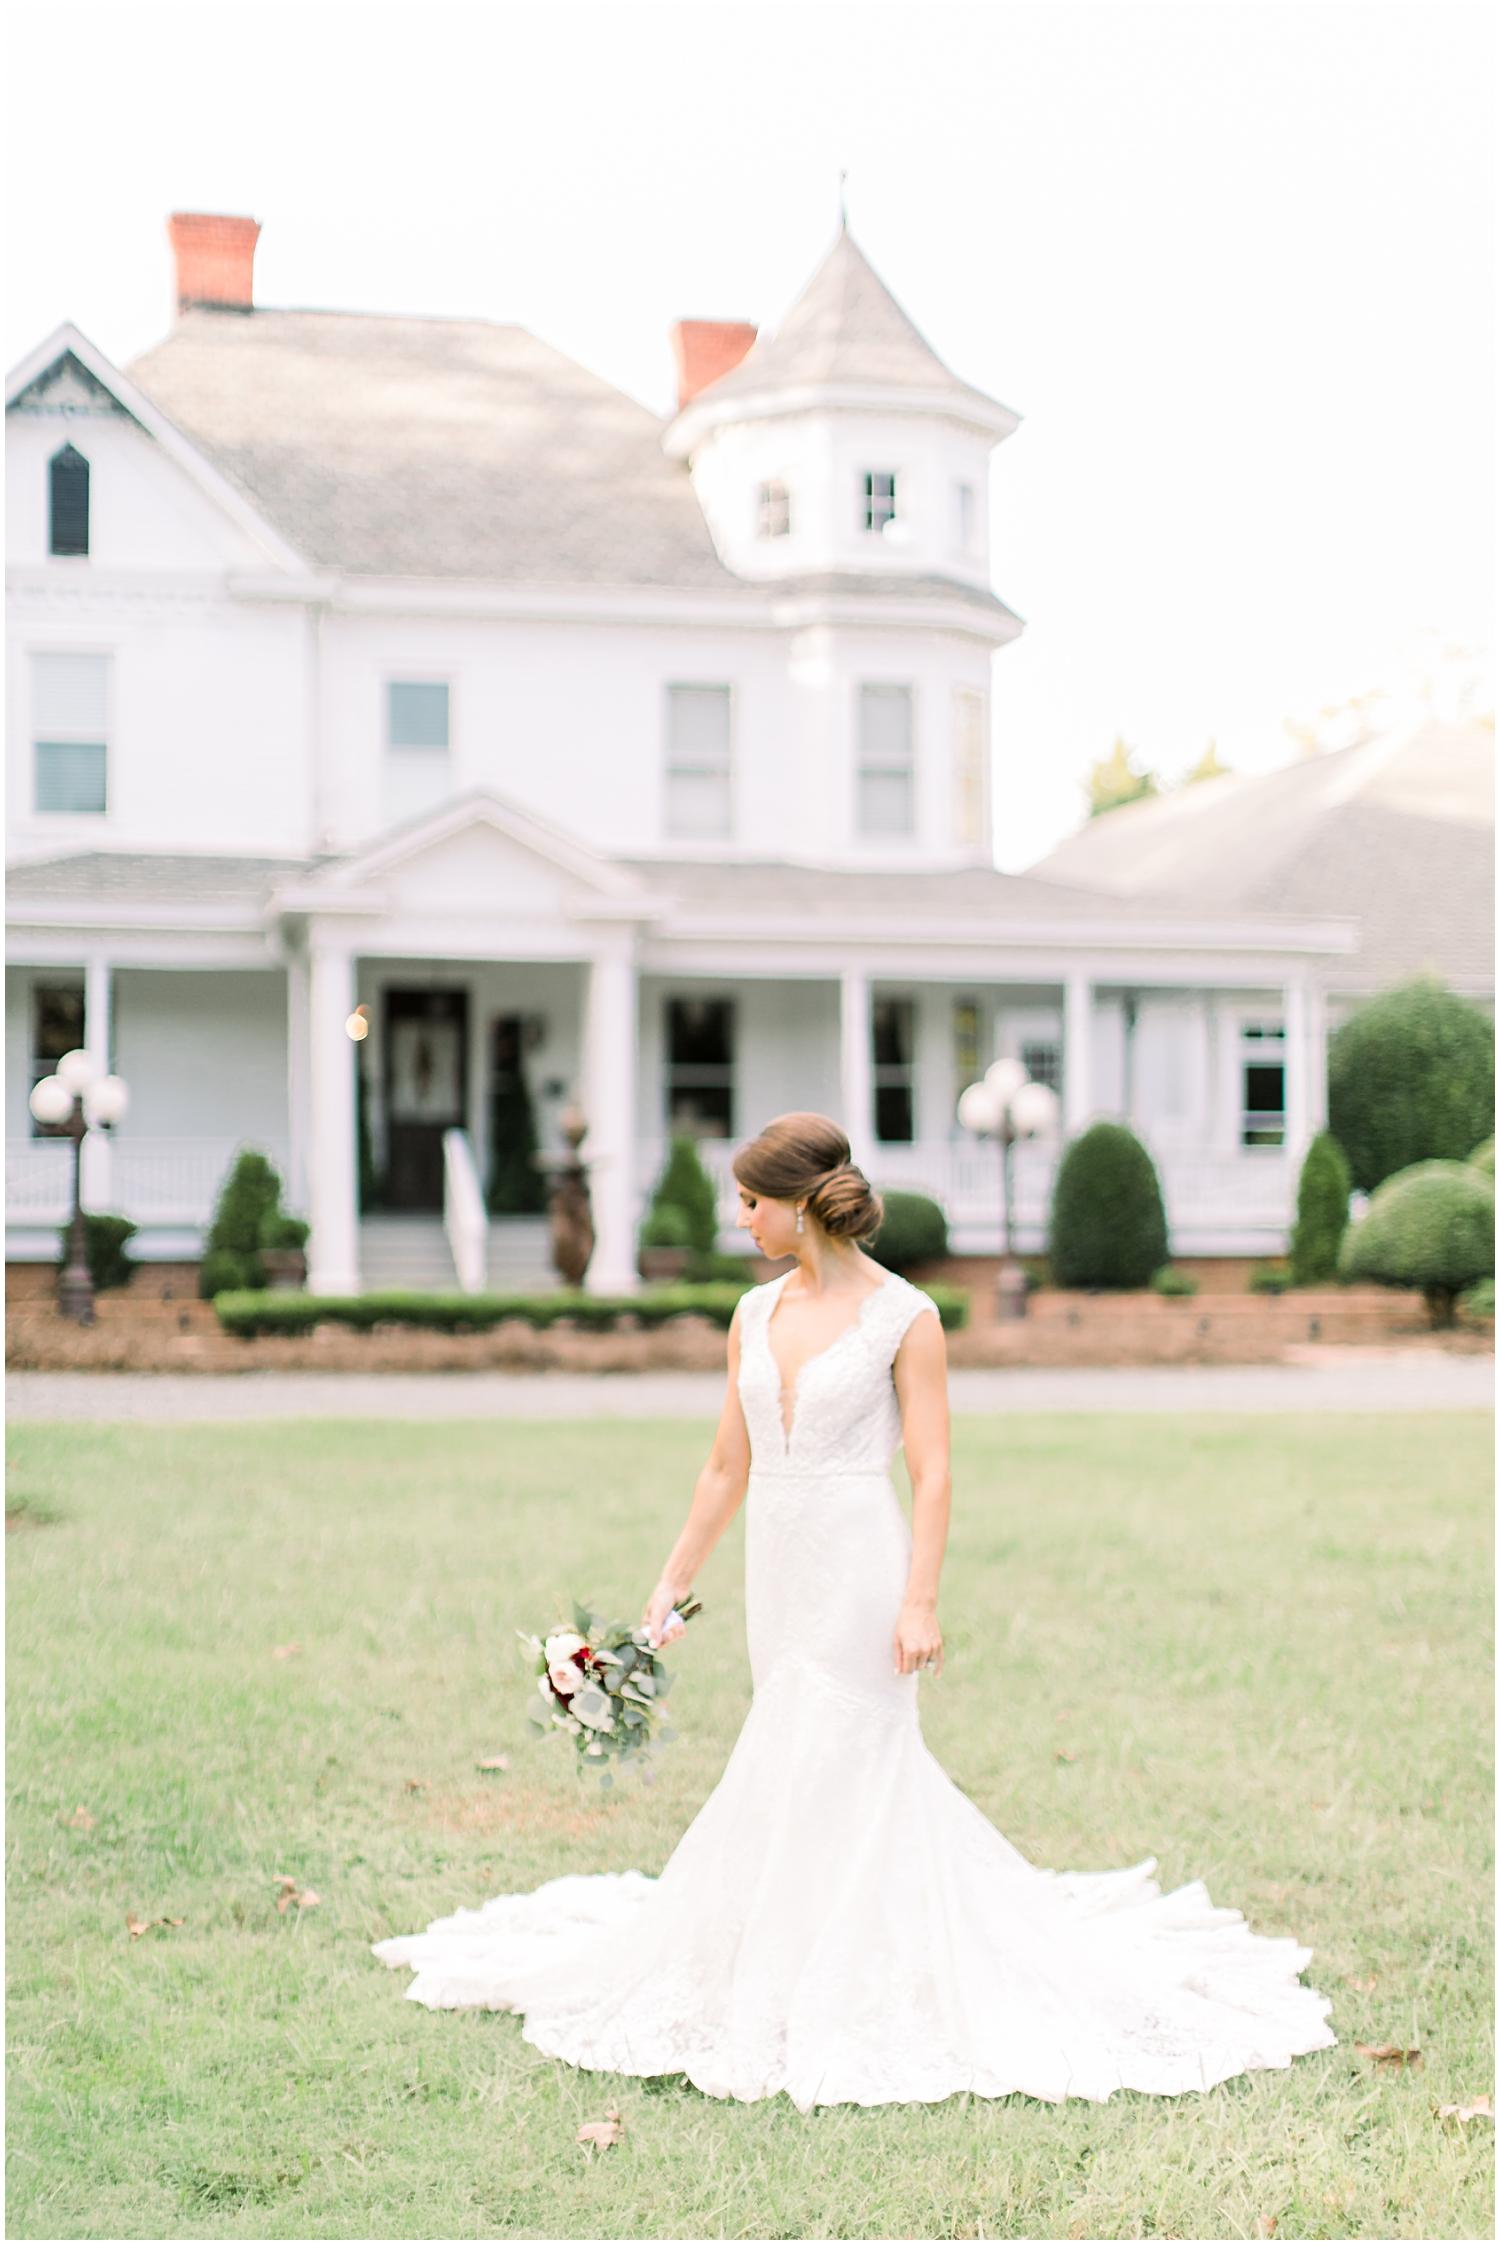 Victorian Crow's Nest  Bridal Session, Charlotte NC Wedding_Erin L. Taylor Photography_0004.jpg